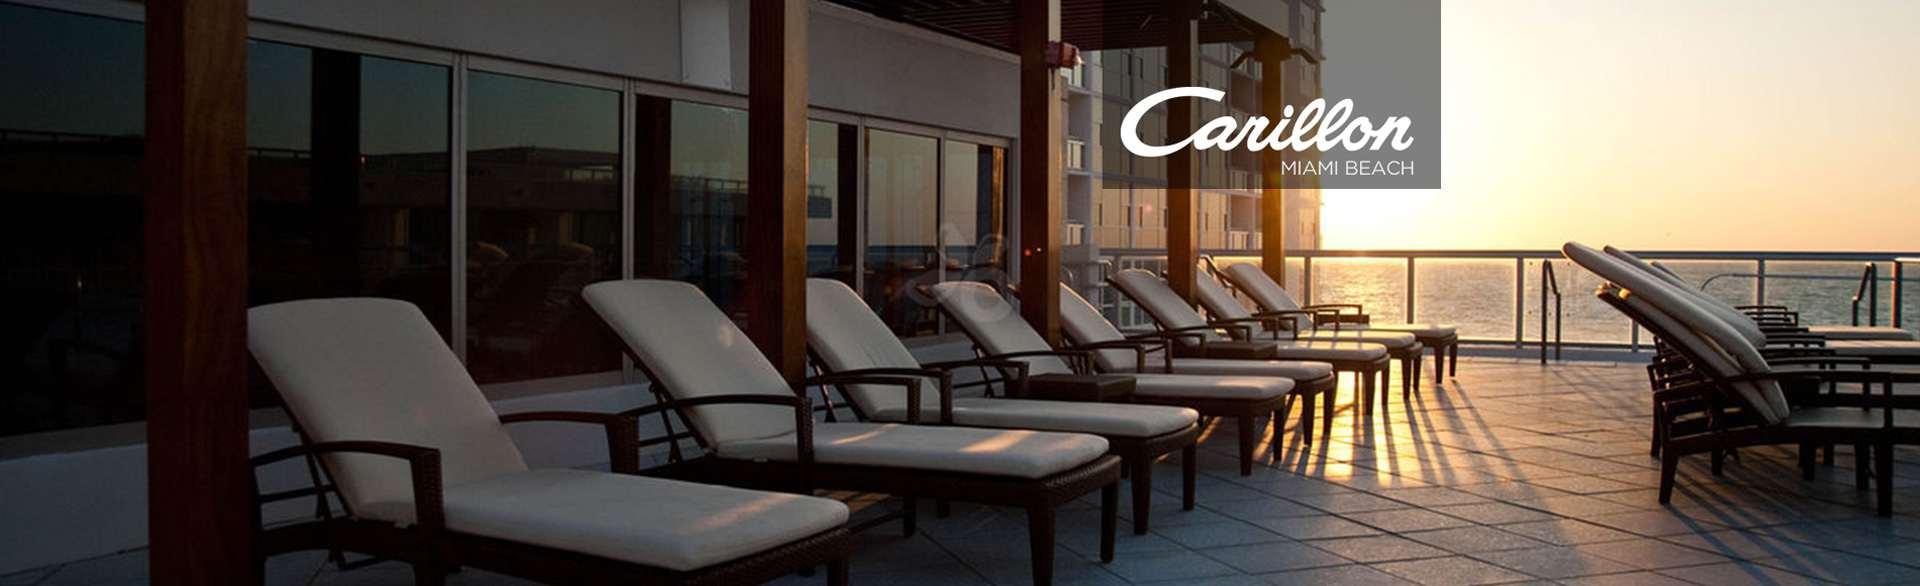 sliders_hotels_carillon